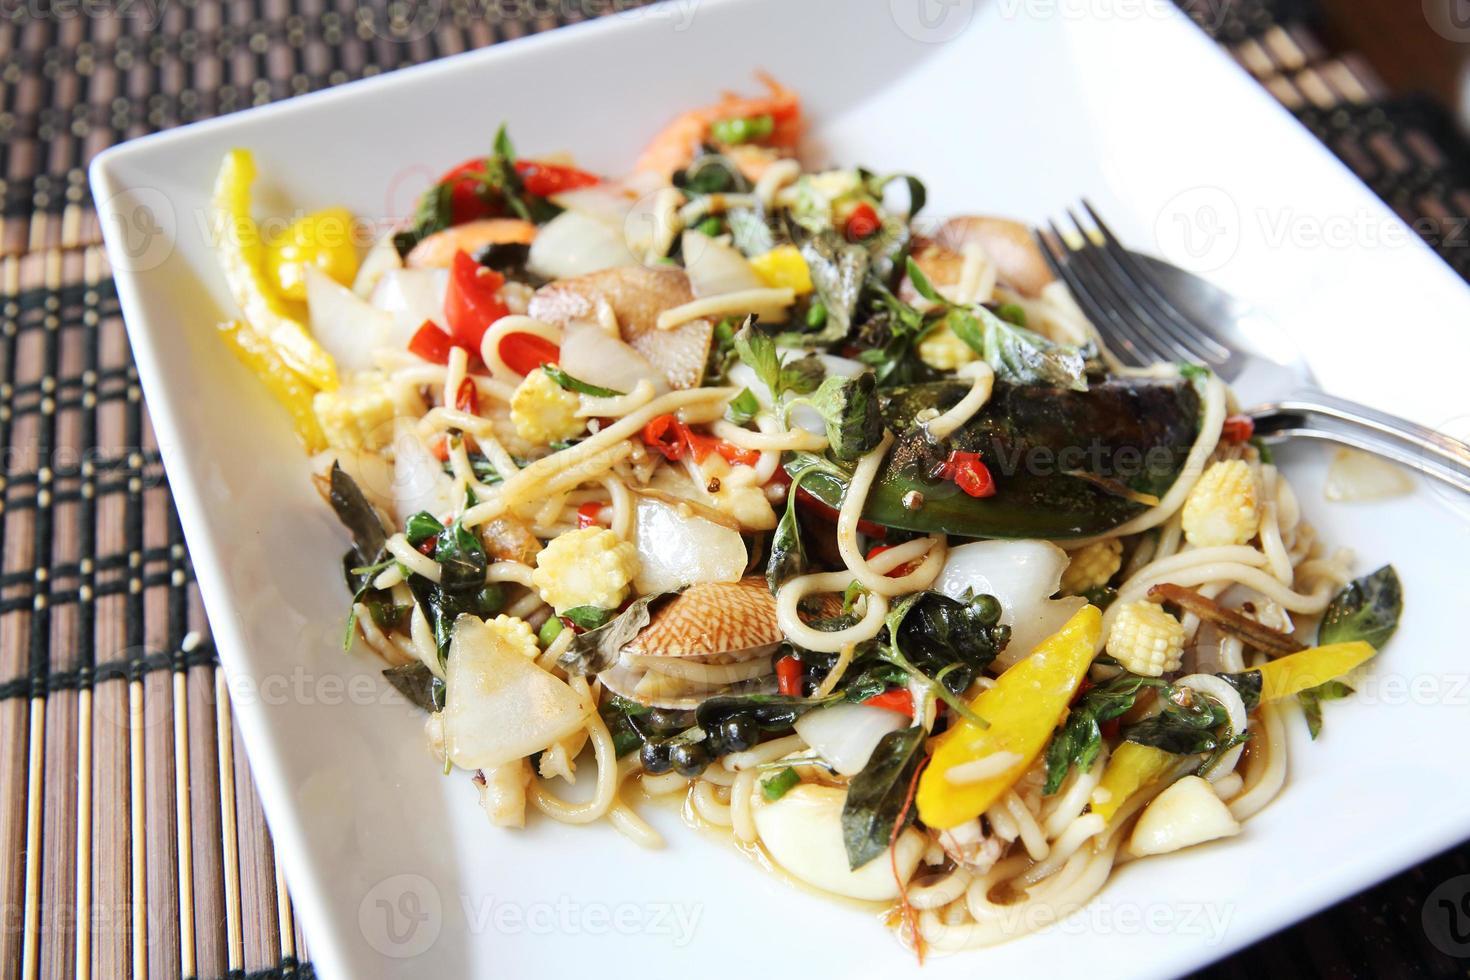 espaguete picante frutos do mar estilo tailandês foto